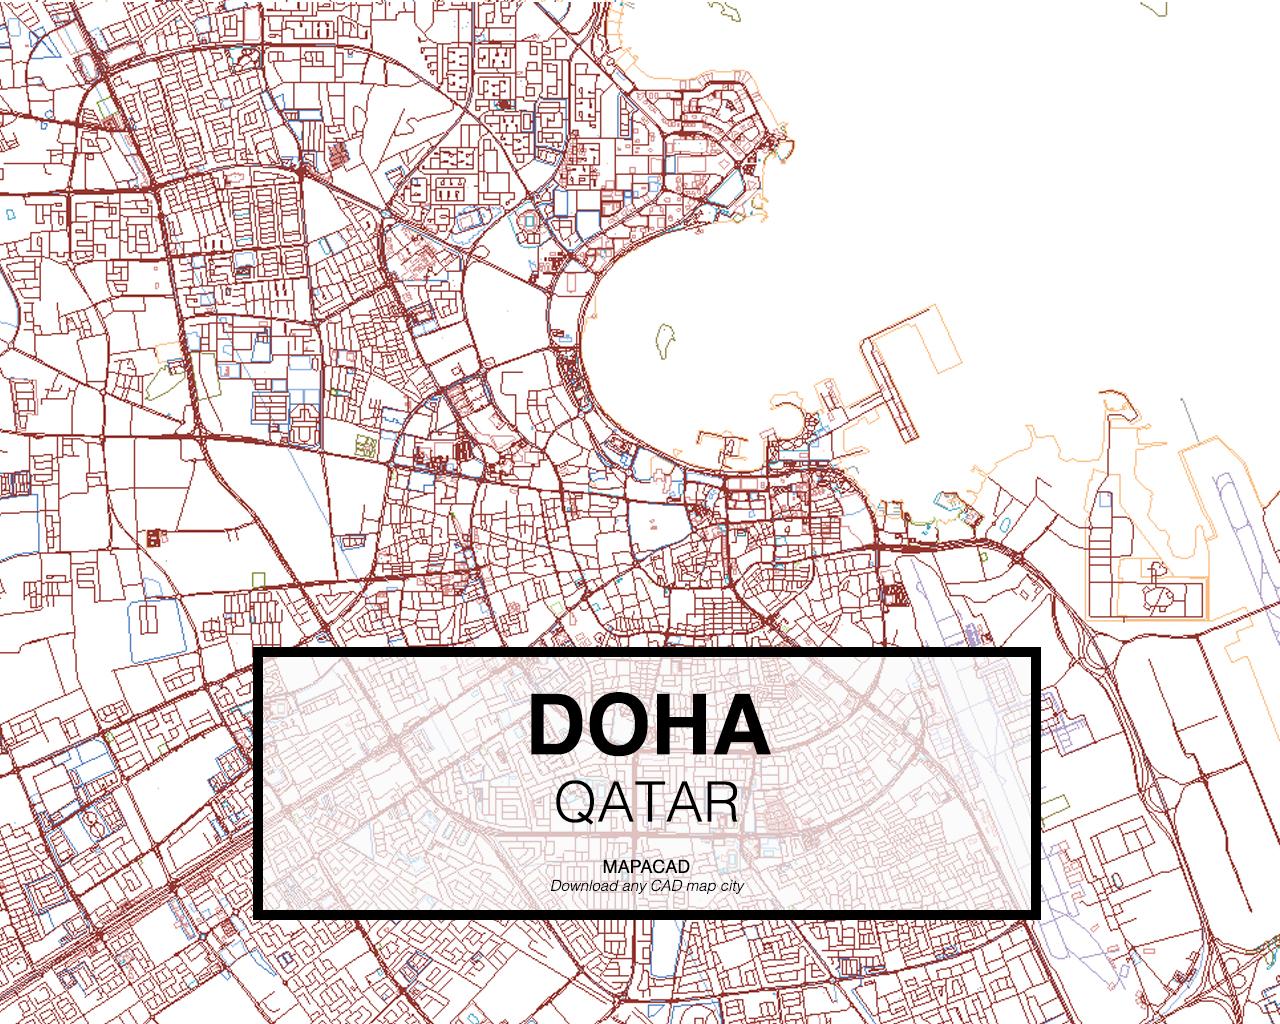 Download jerusalem dwg mapacad doha qatar 02 mapacad download map cad dwg gumiabroncs Choice Image